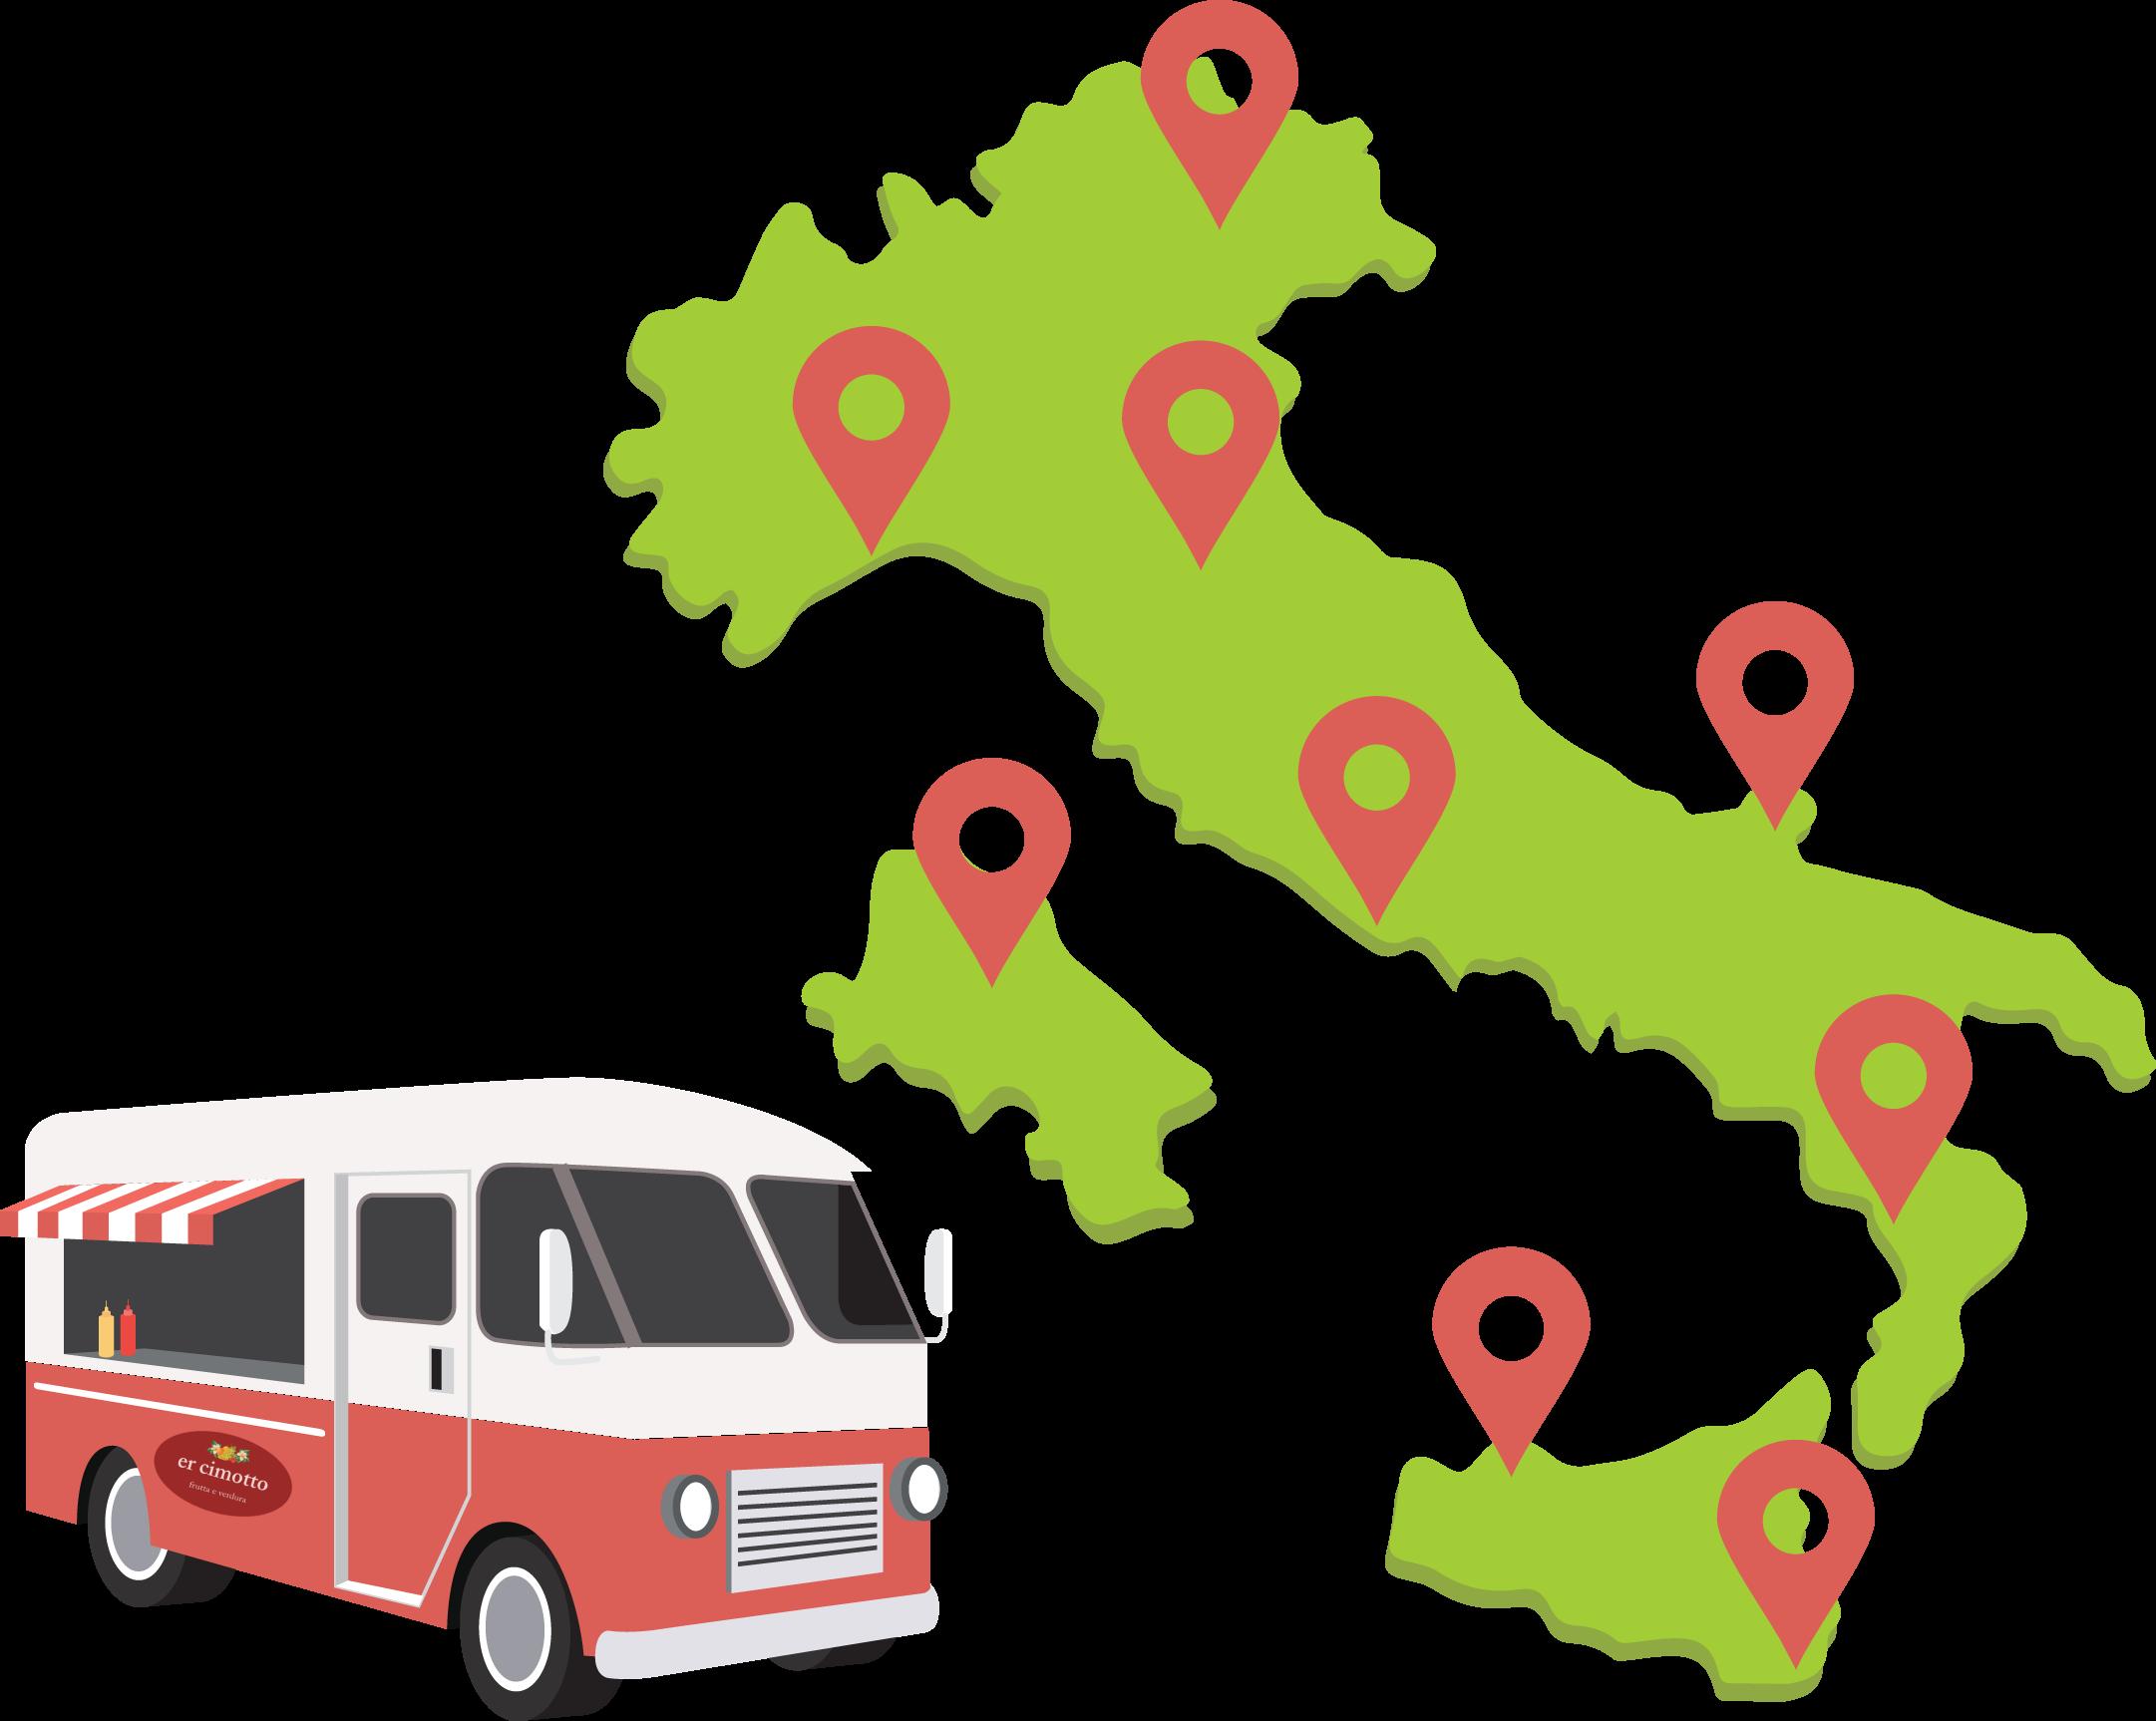 cimotto food truck Roma